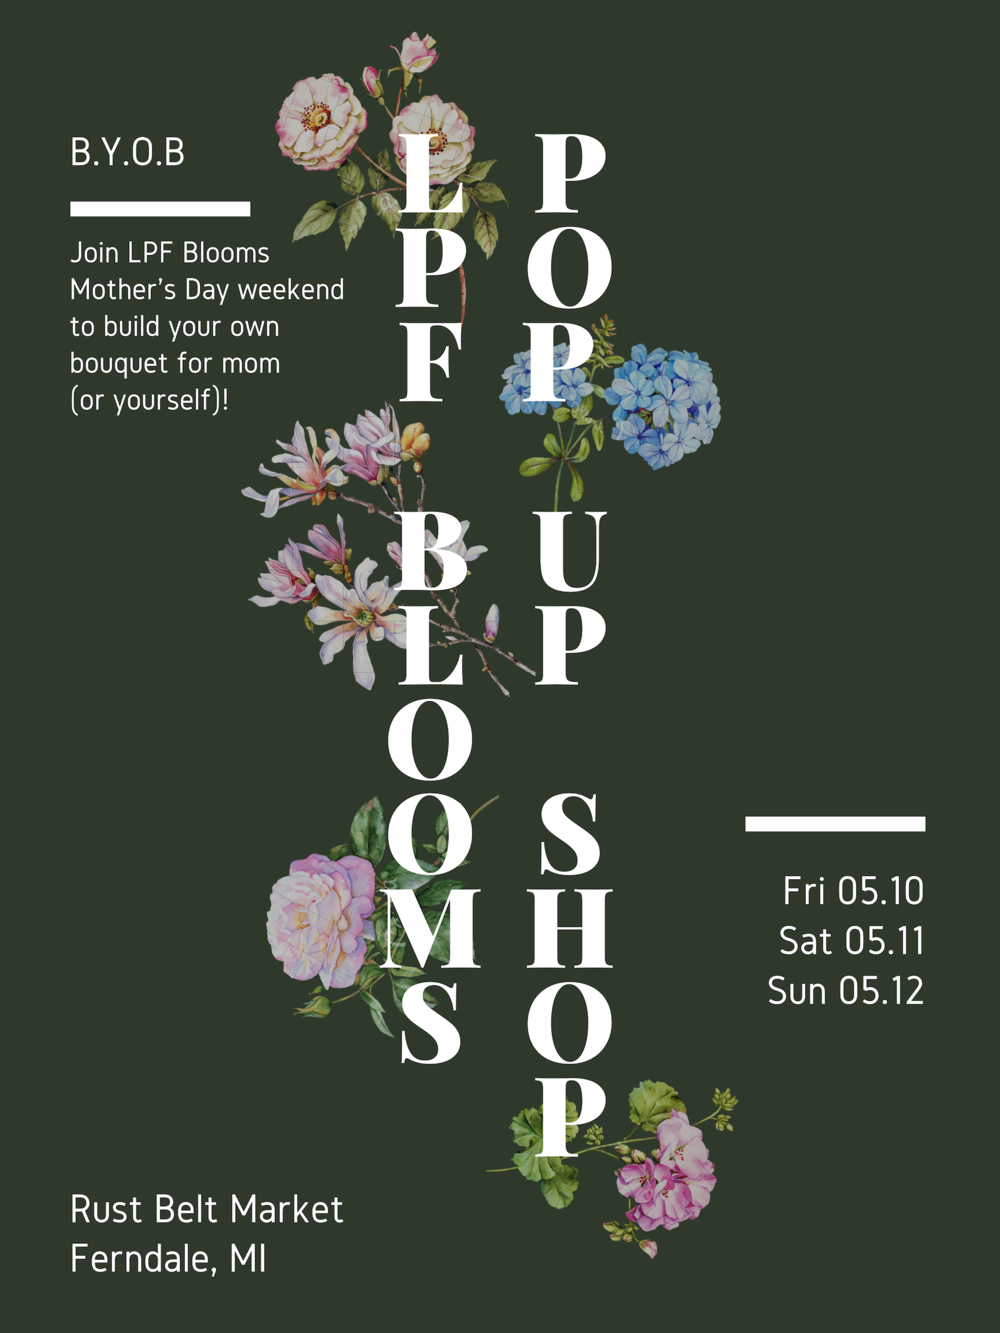 lpf blooms pop up shop.png